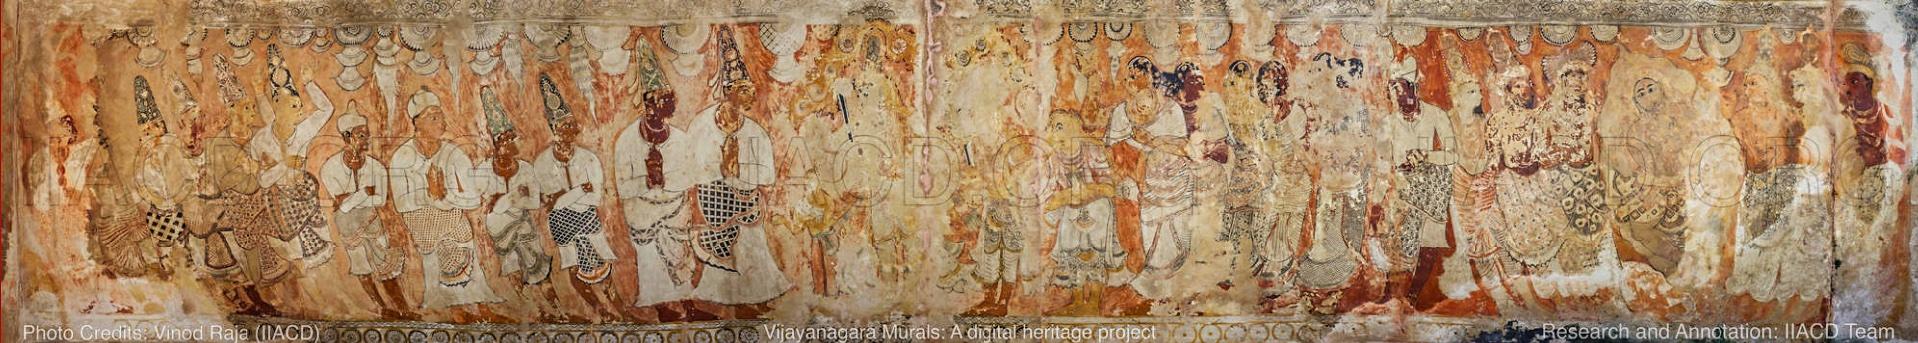 1 Vatapatrasayi Krishna and Veerabhadra 2 c